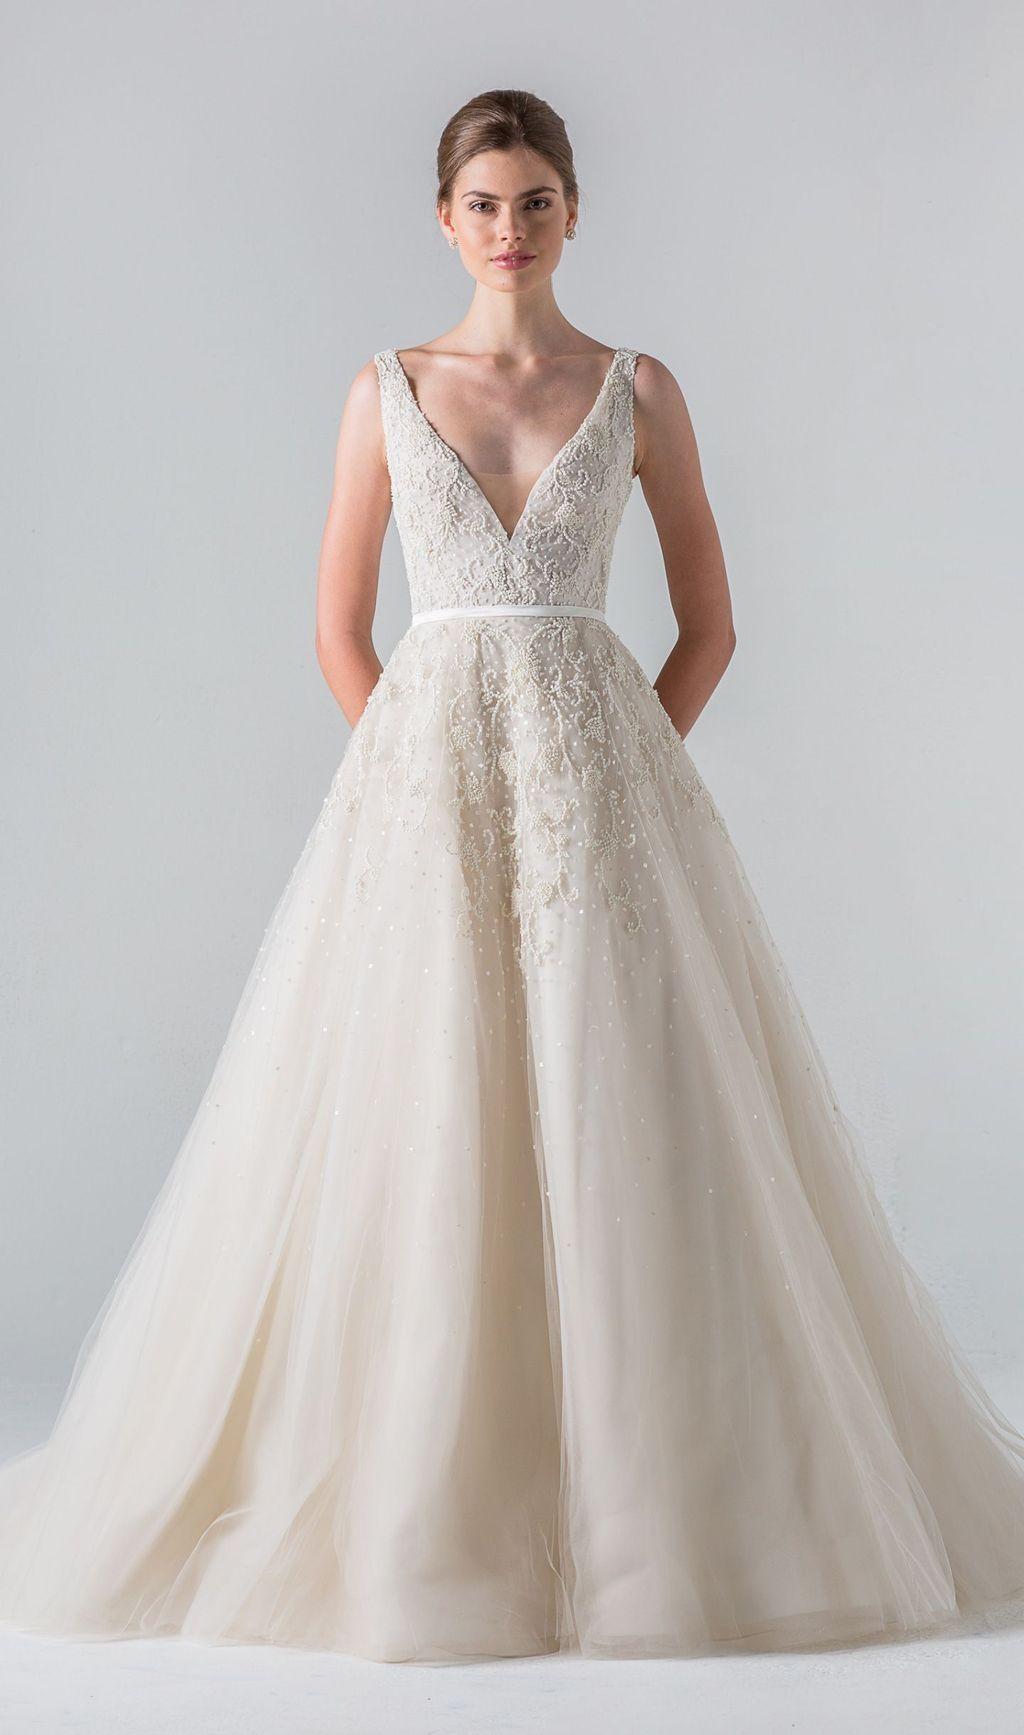 gorgeous v neck tulle wedding dress ideas dress pinterest